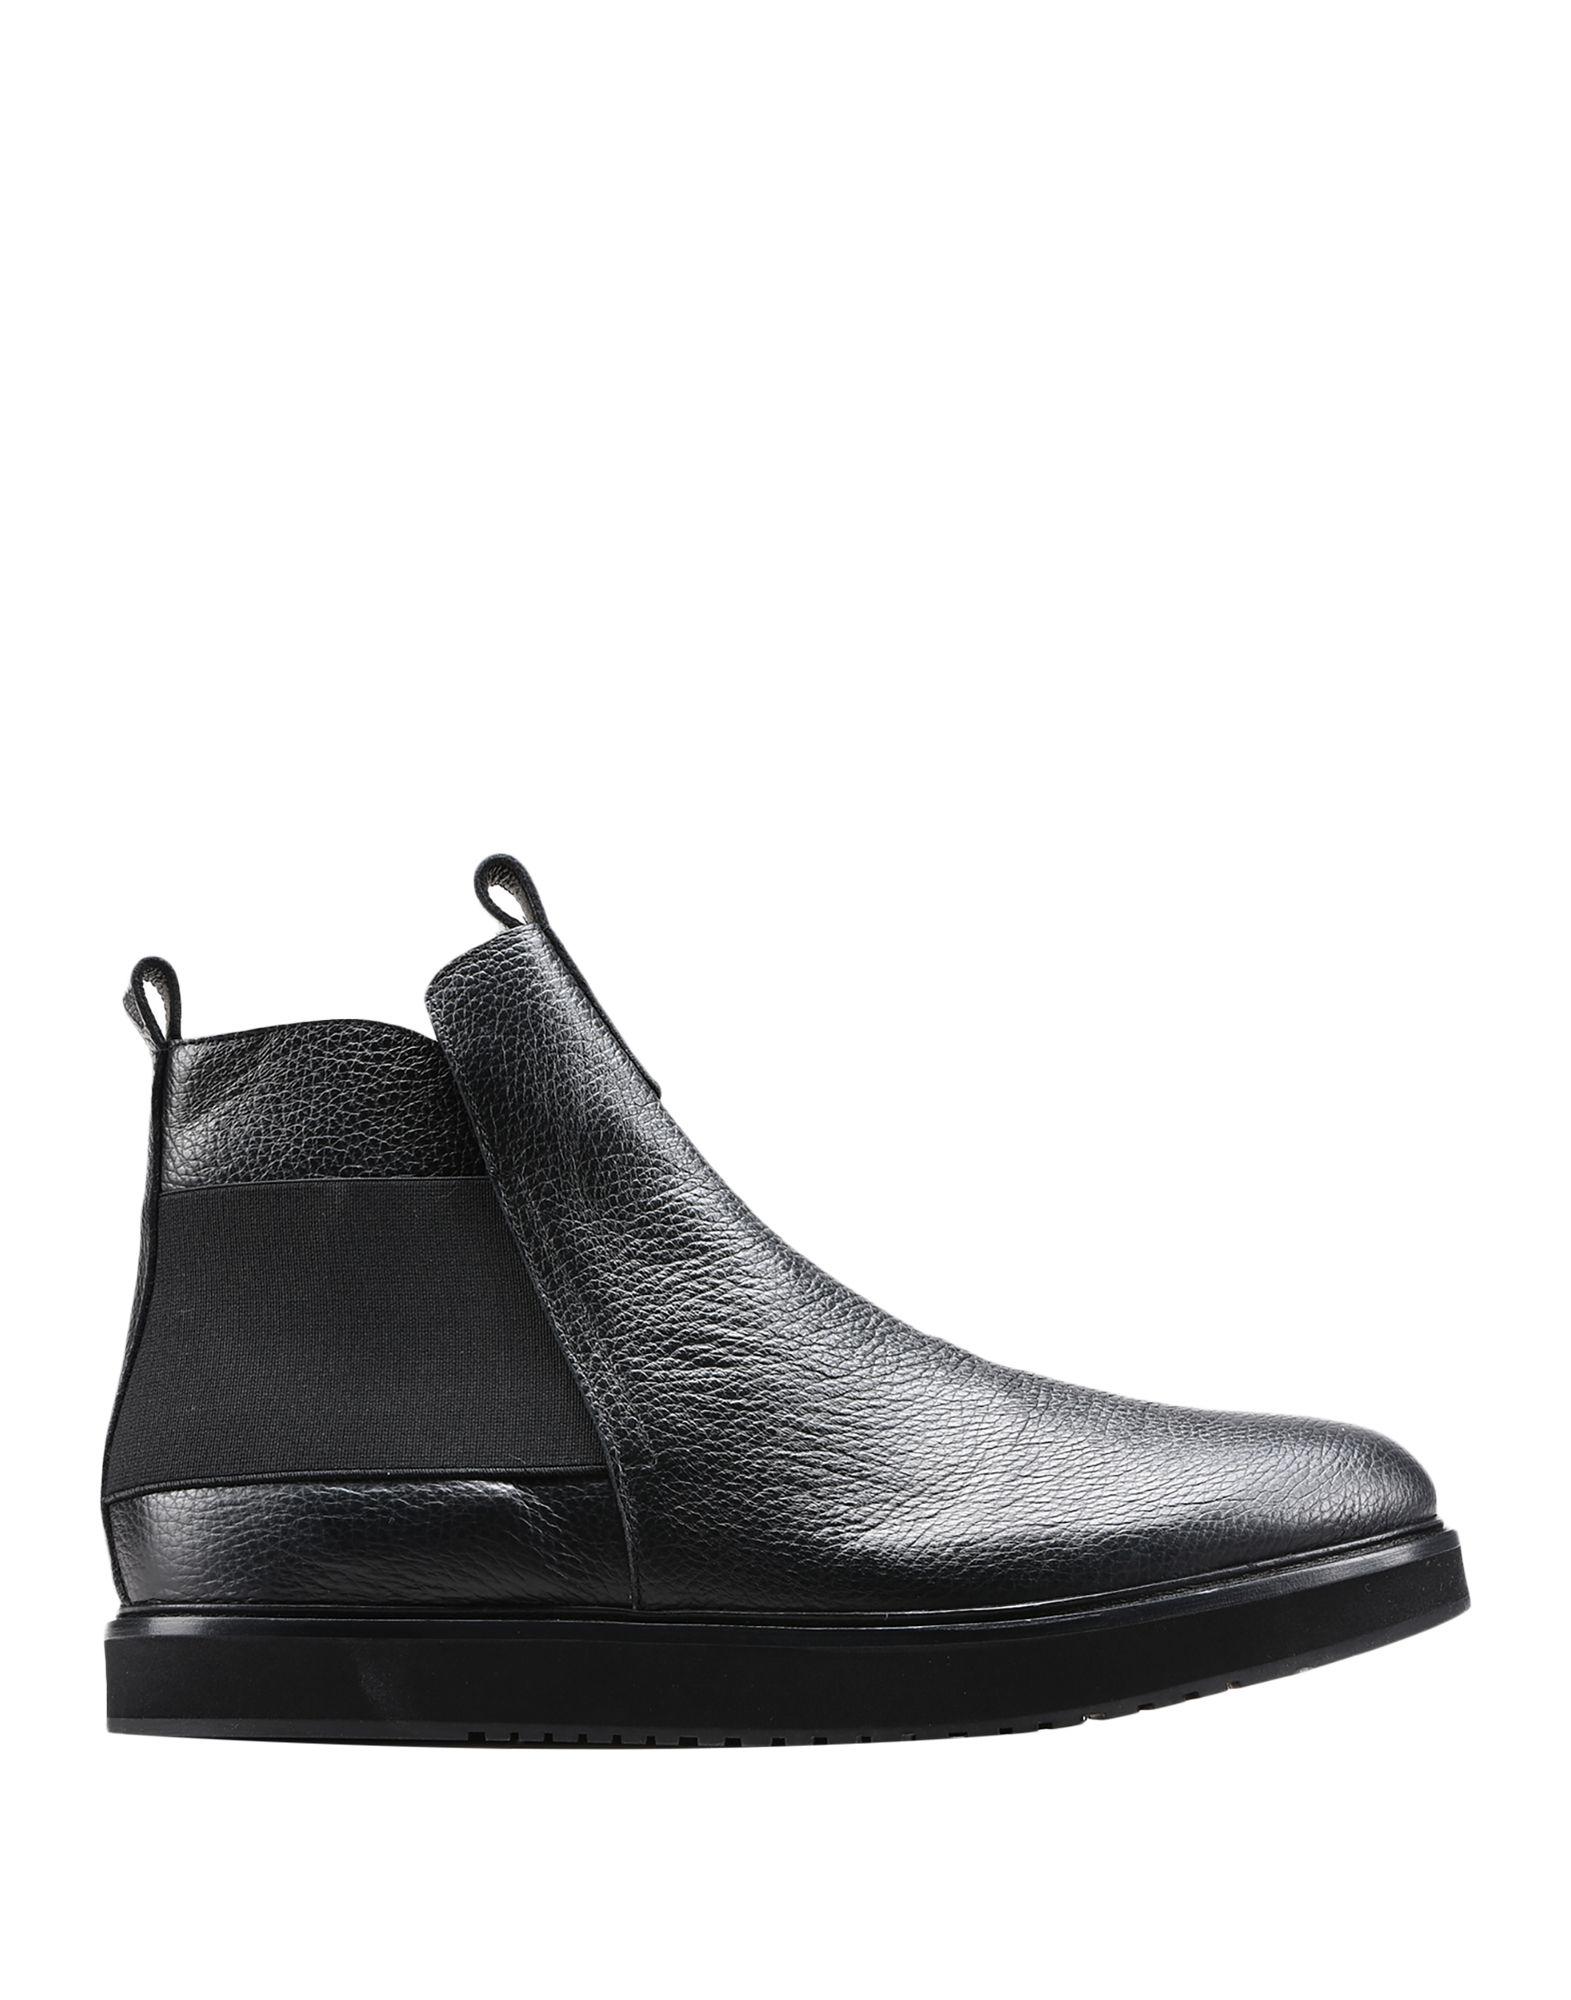 Emporio Armani Boots - Men Emporio Armani Boots - online on  Australia - Boots 11579587DW 331ff2